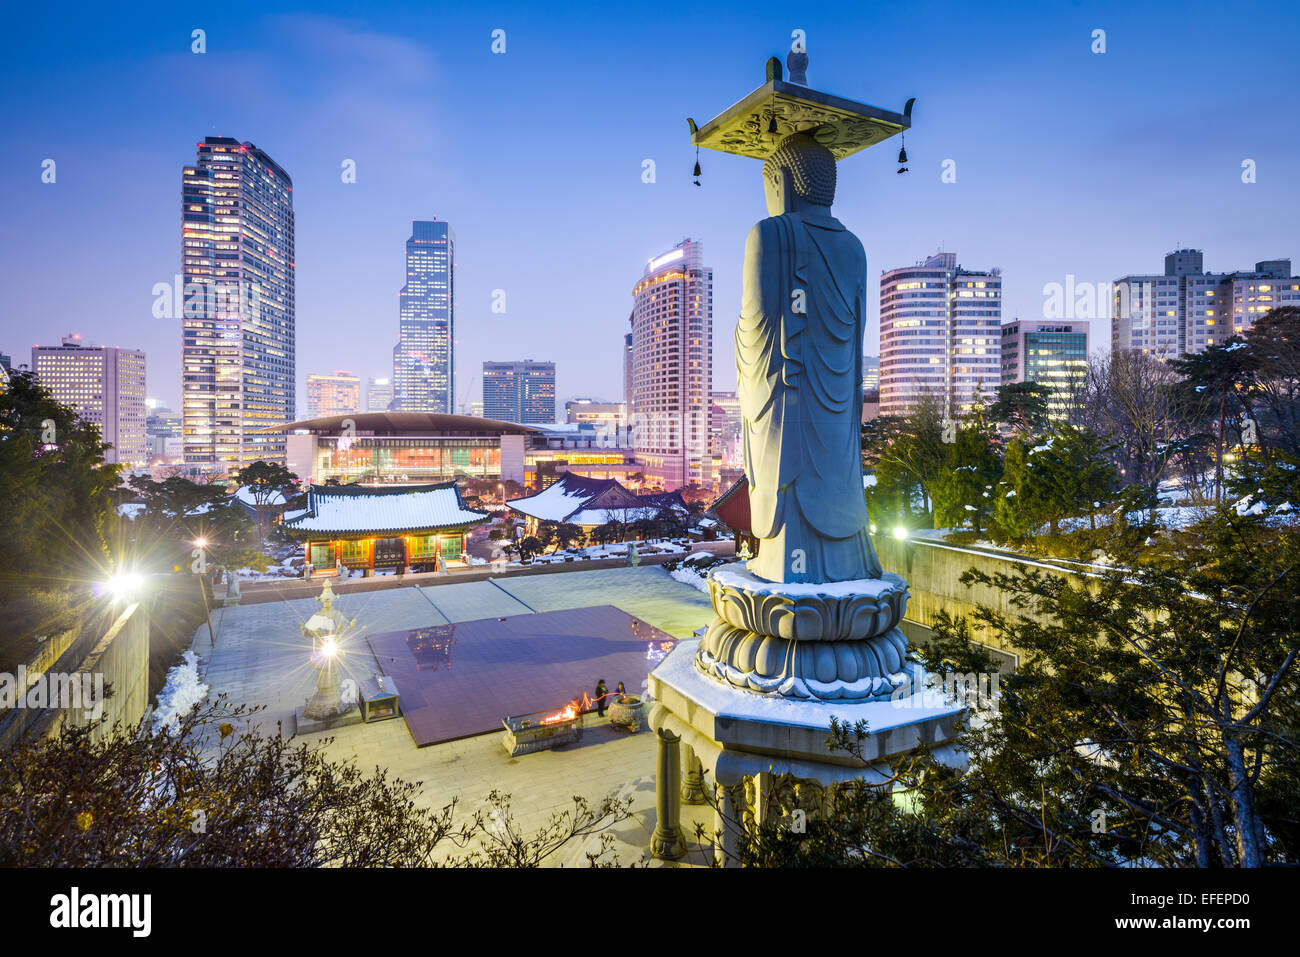 Bongeunsa Temple in the Gangnam District of Seoul, Korea. Stock Photo